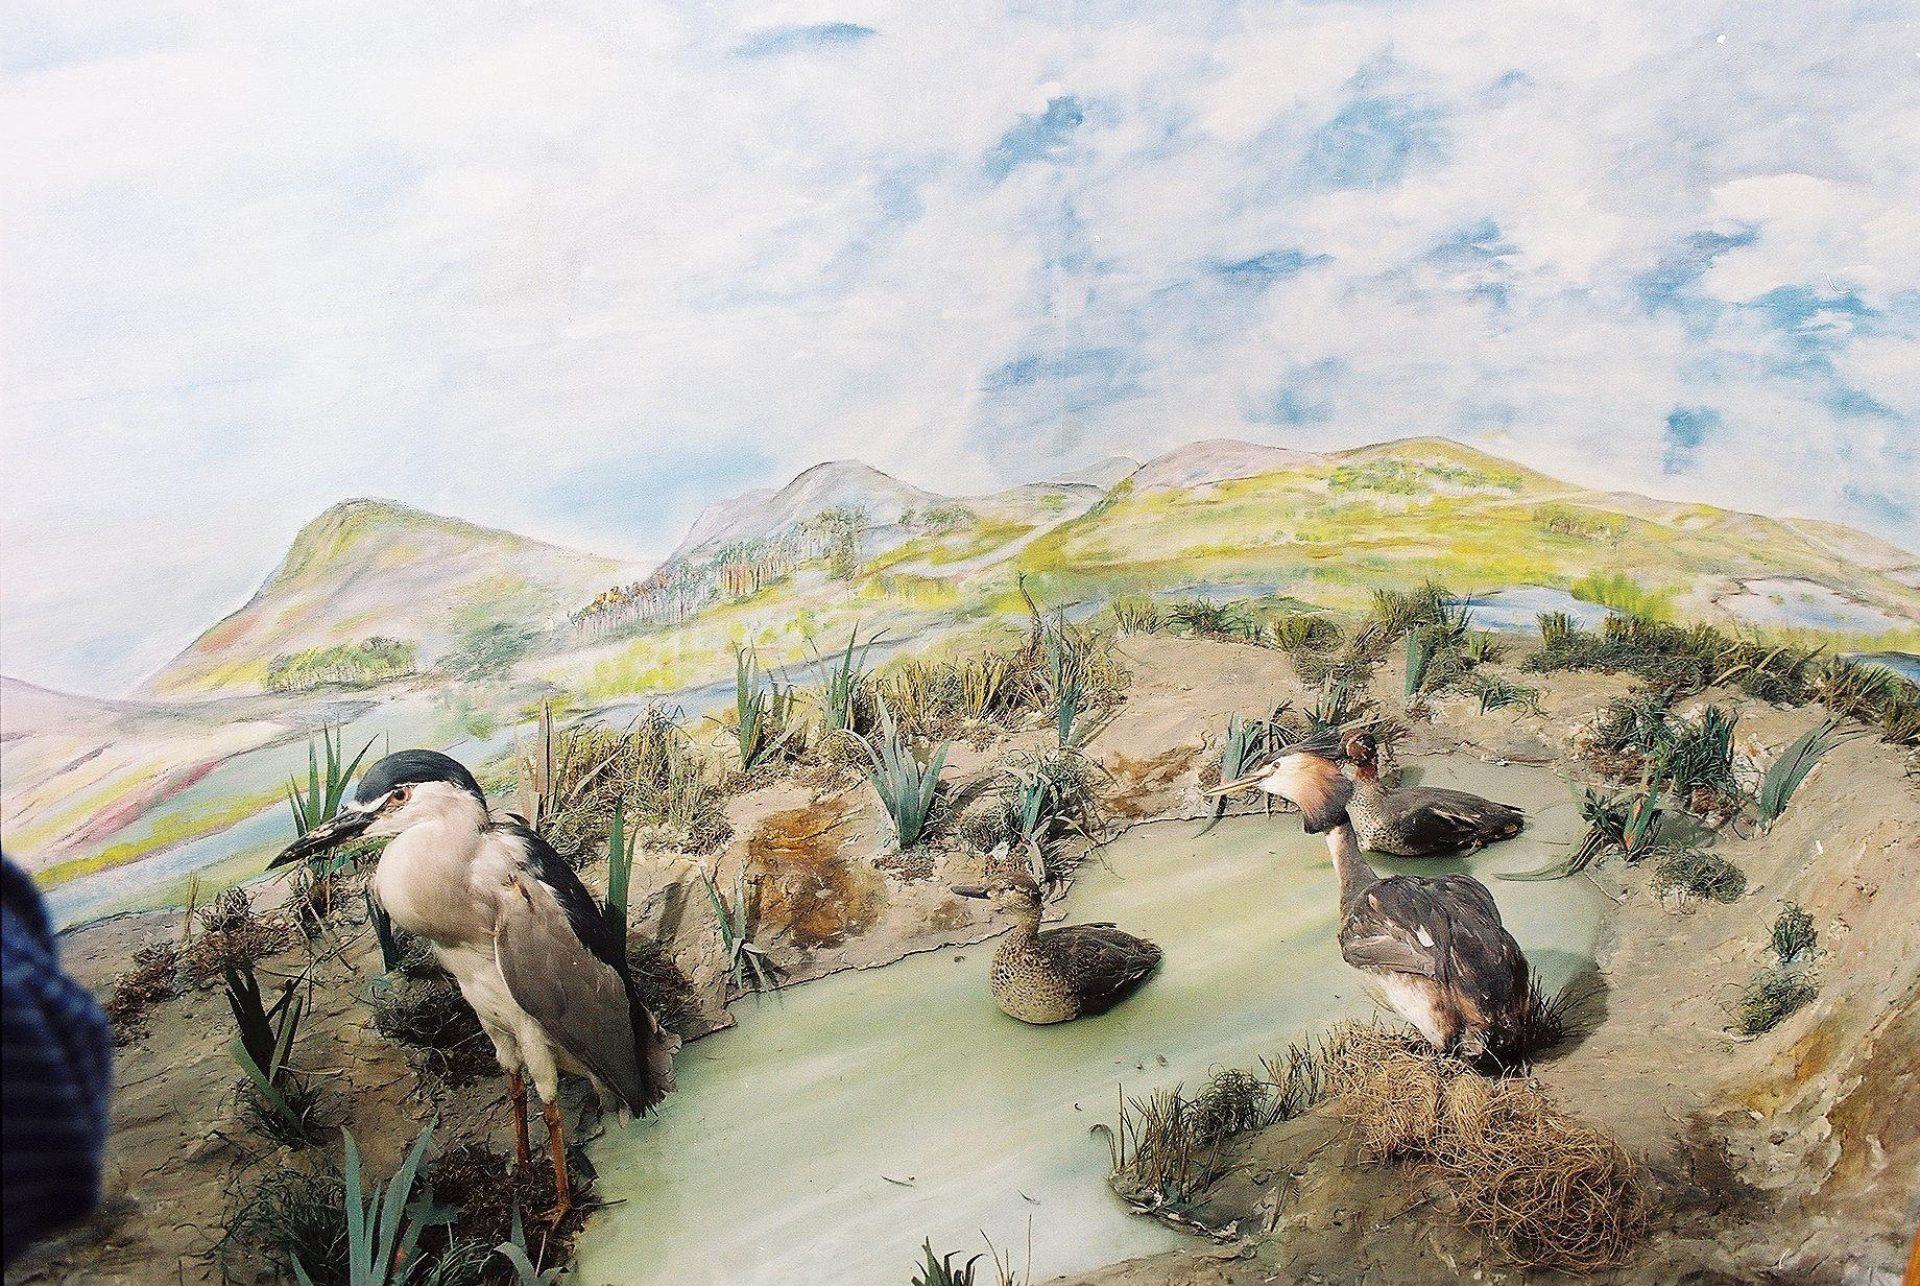 Petrit Halilaj, Special Edition (ex-Natural History Museum of Kosovo), 2013 (33/80)